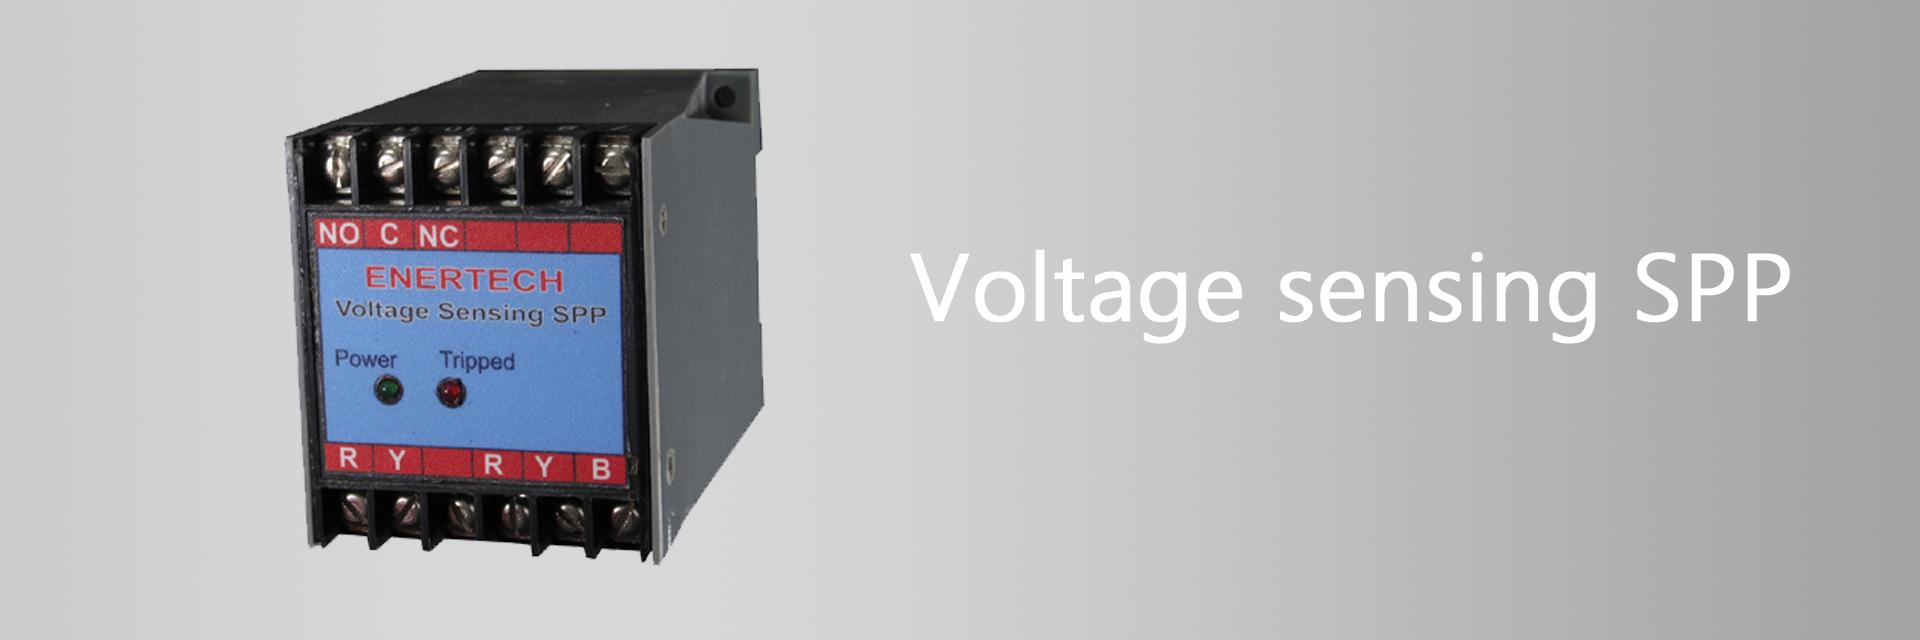 Voltage Sensing SPP